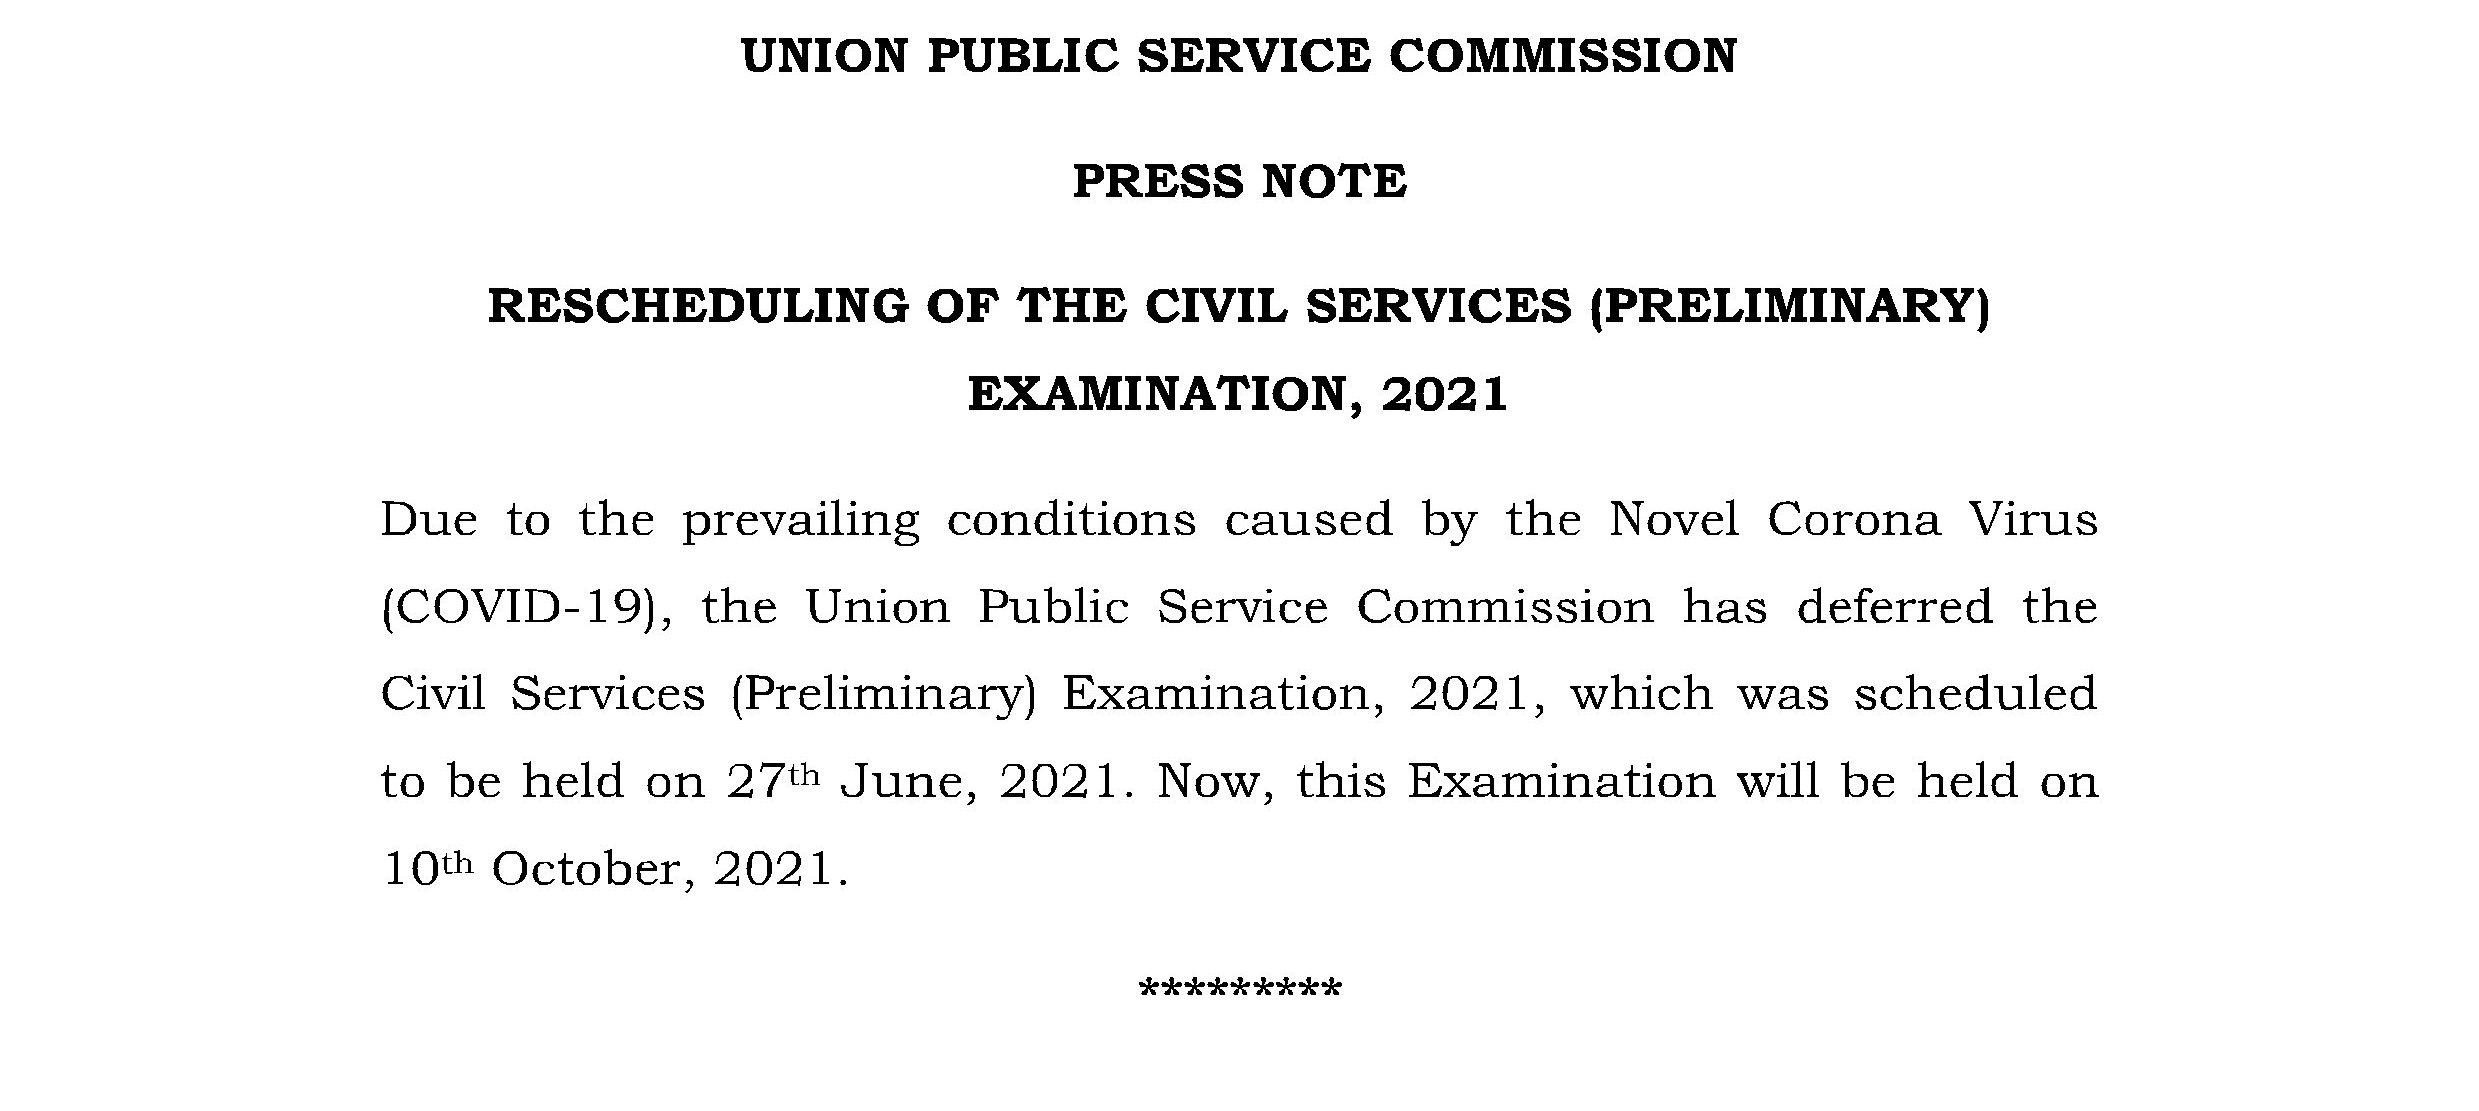 UPSC Civil Services 27 June Exam Postponed – New Exam October 2021